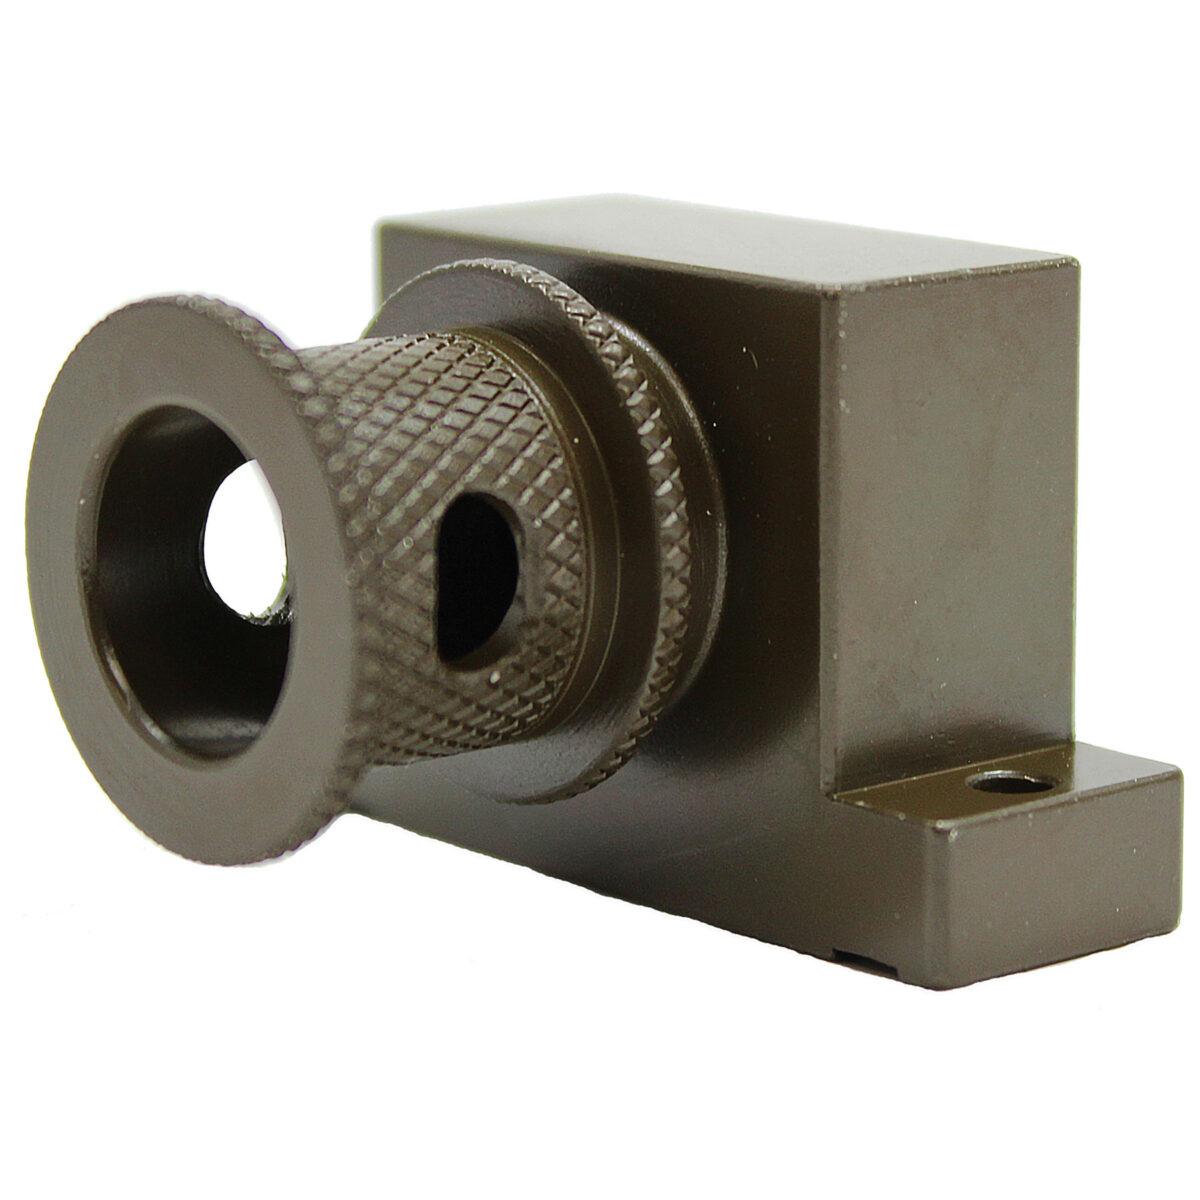 Backshell 205 Series Side Entry CAD OD over E Nickel